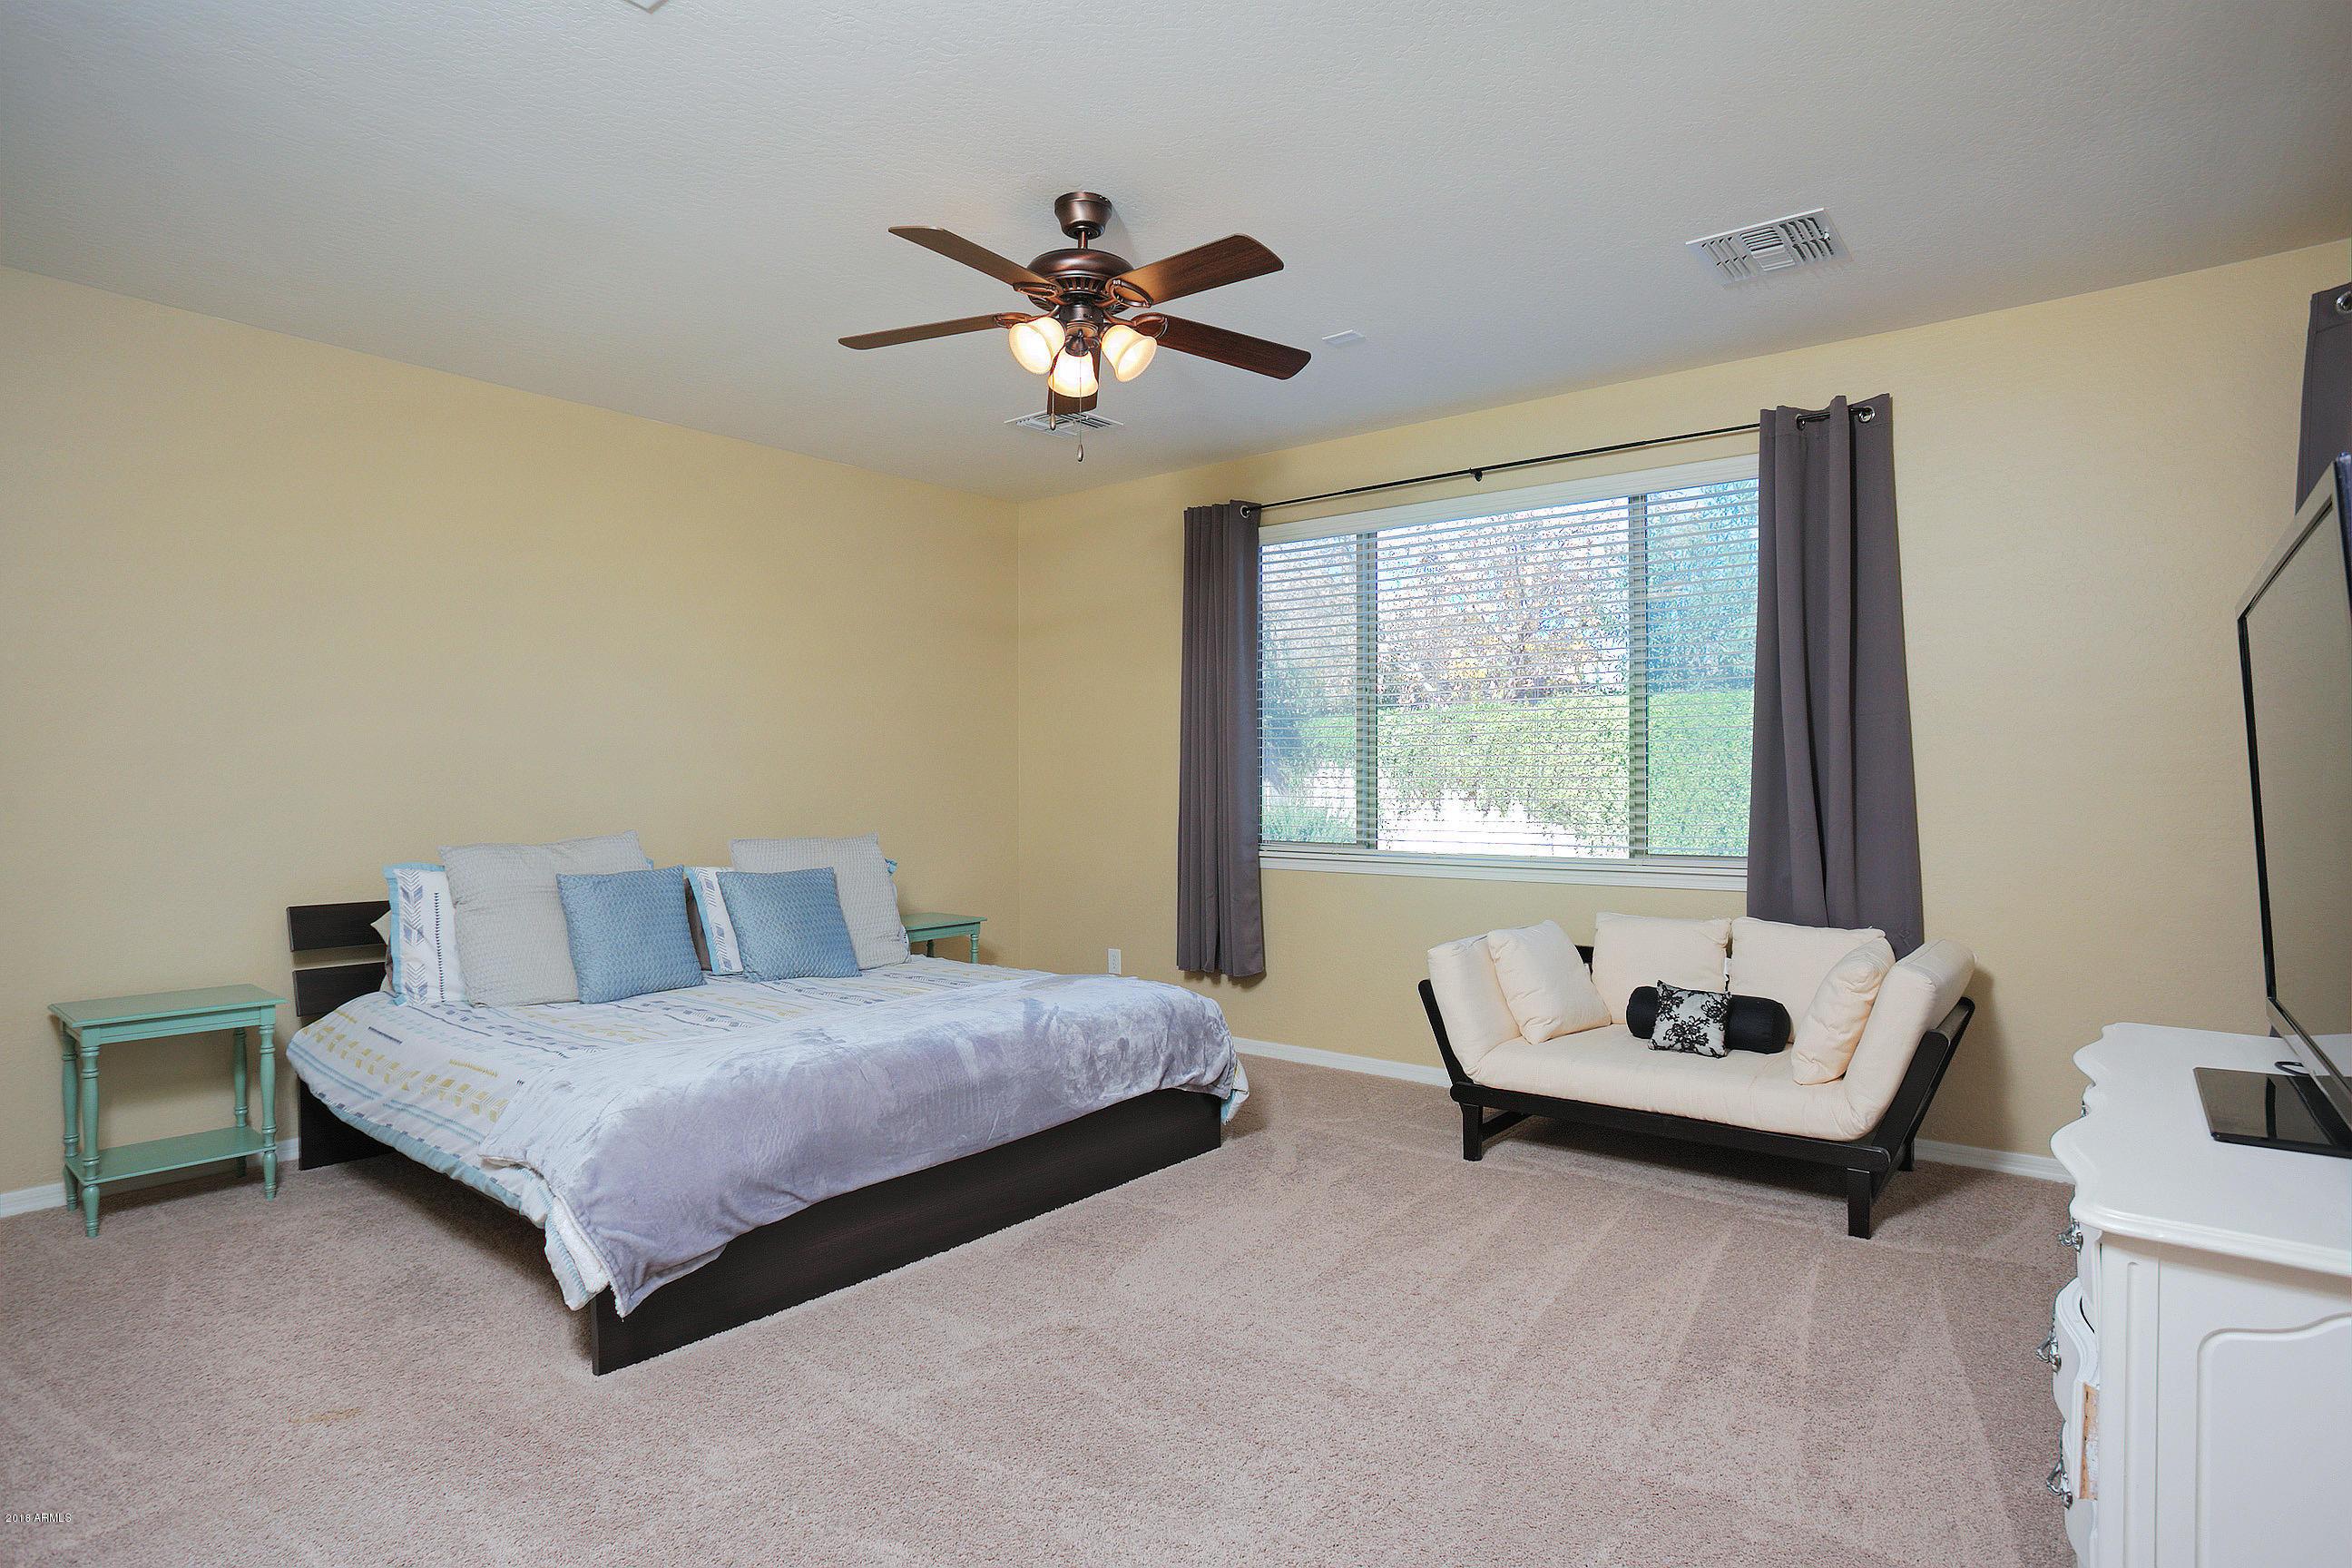 2552 E PLUM Street, Gilbert, 85298 - SOLD LISTING, MLS # 5861267   Better  Homes and Gardens BloomTree Realty